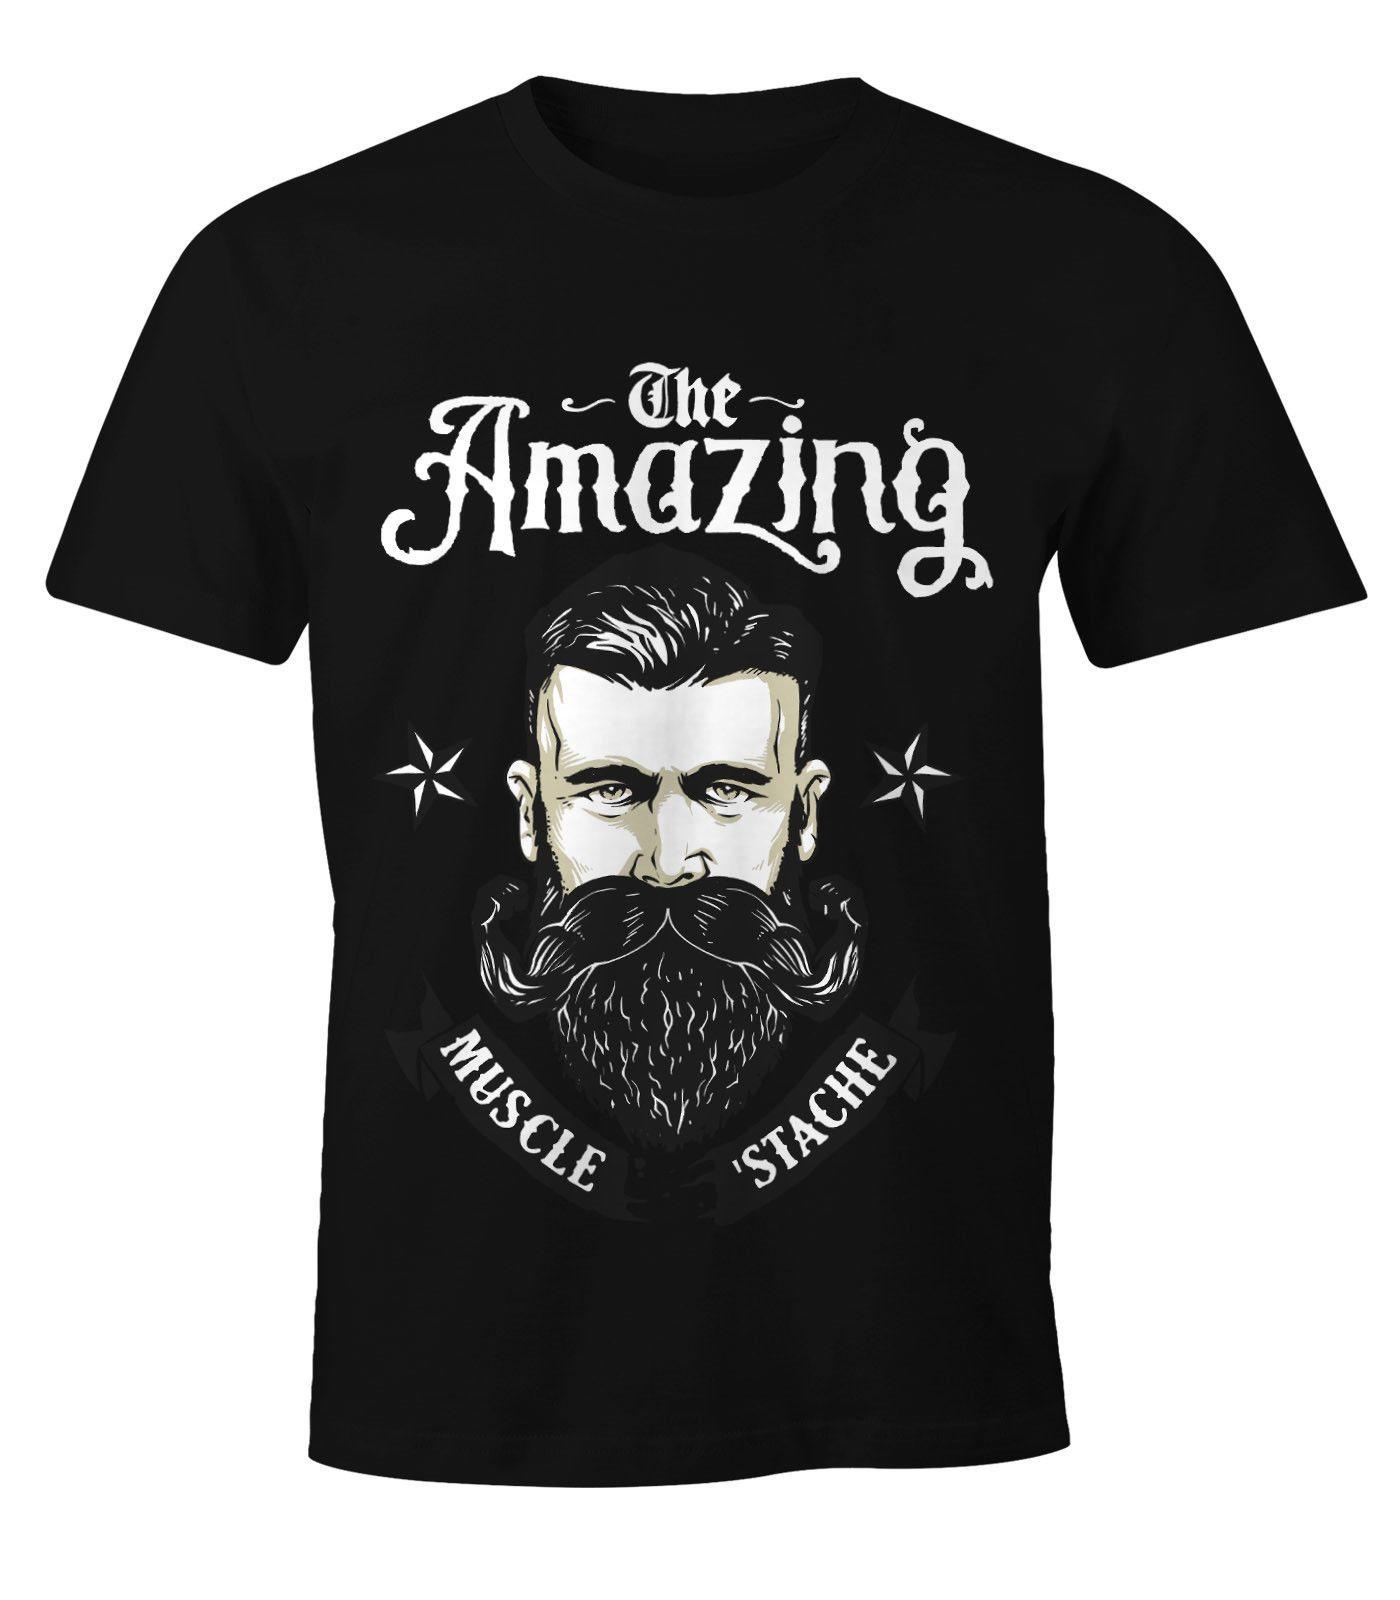 Herren T-Shirt - Barbe The Amazing Muscle Mustache Bart Barber Shop Barbier 100% coton à manches courtes O col Hauts T-shirts